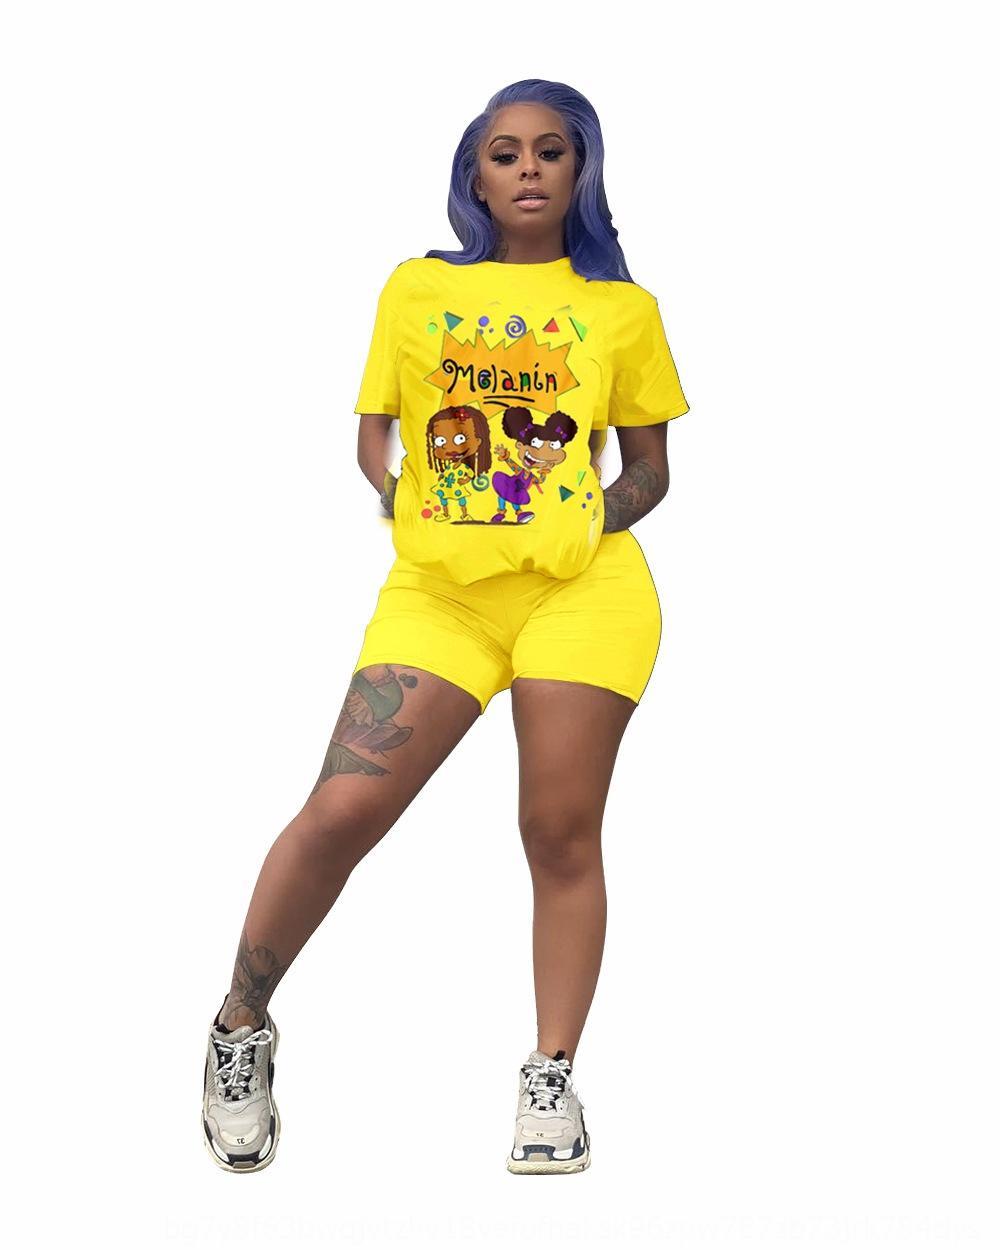 2020 desenho animado ocasional 2020 moda terno de banda desenhada de moda terno mulheres mulheres casuais 8EhfN